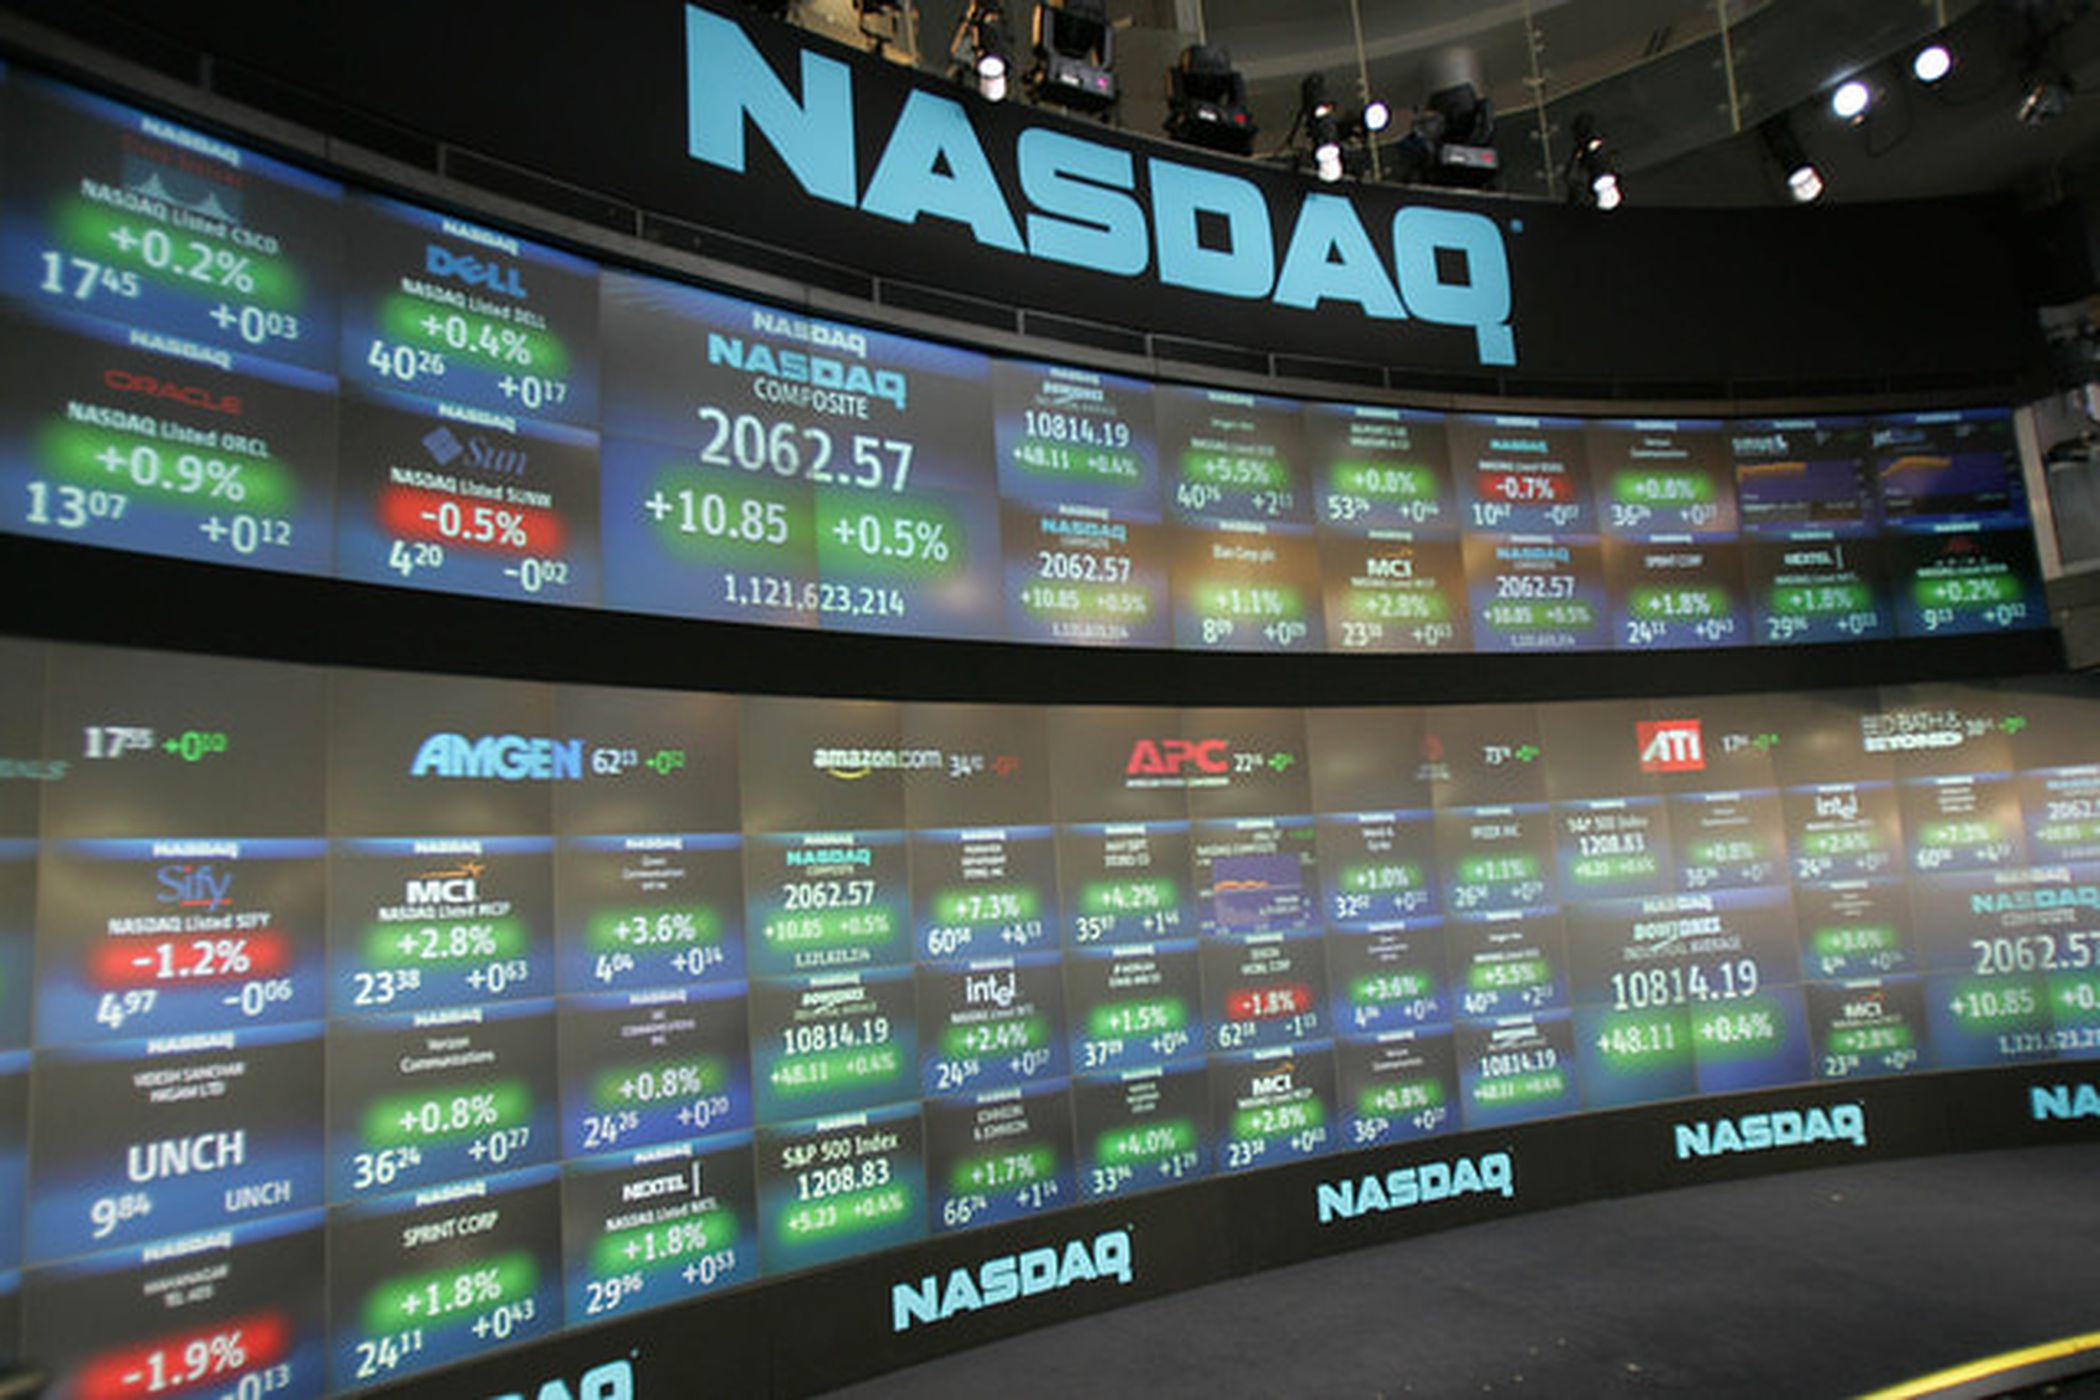 Nasdaq - The Week on Wall Street Thumbnail